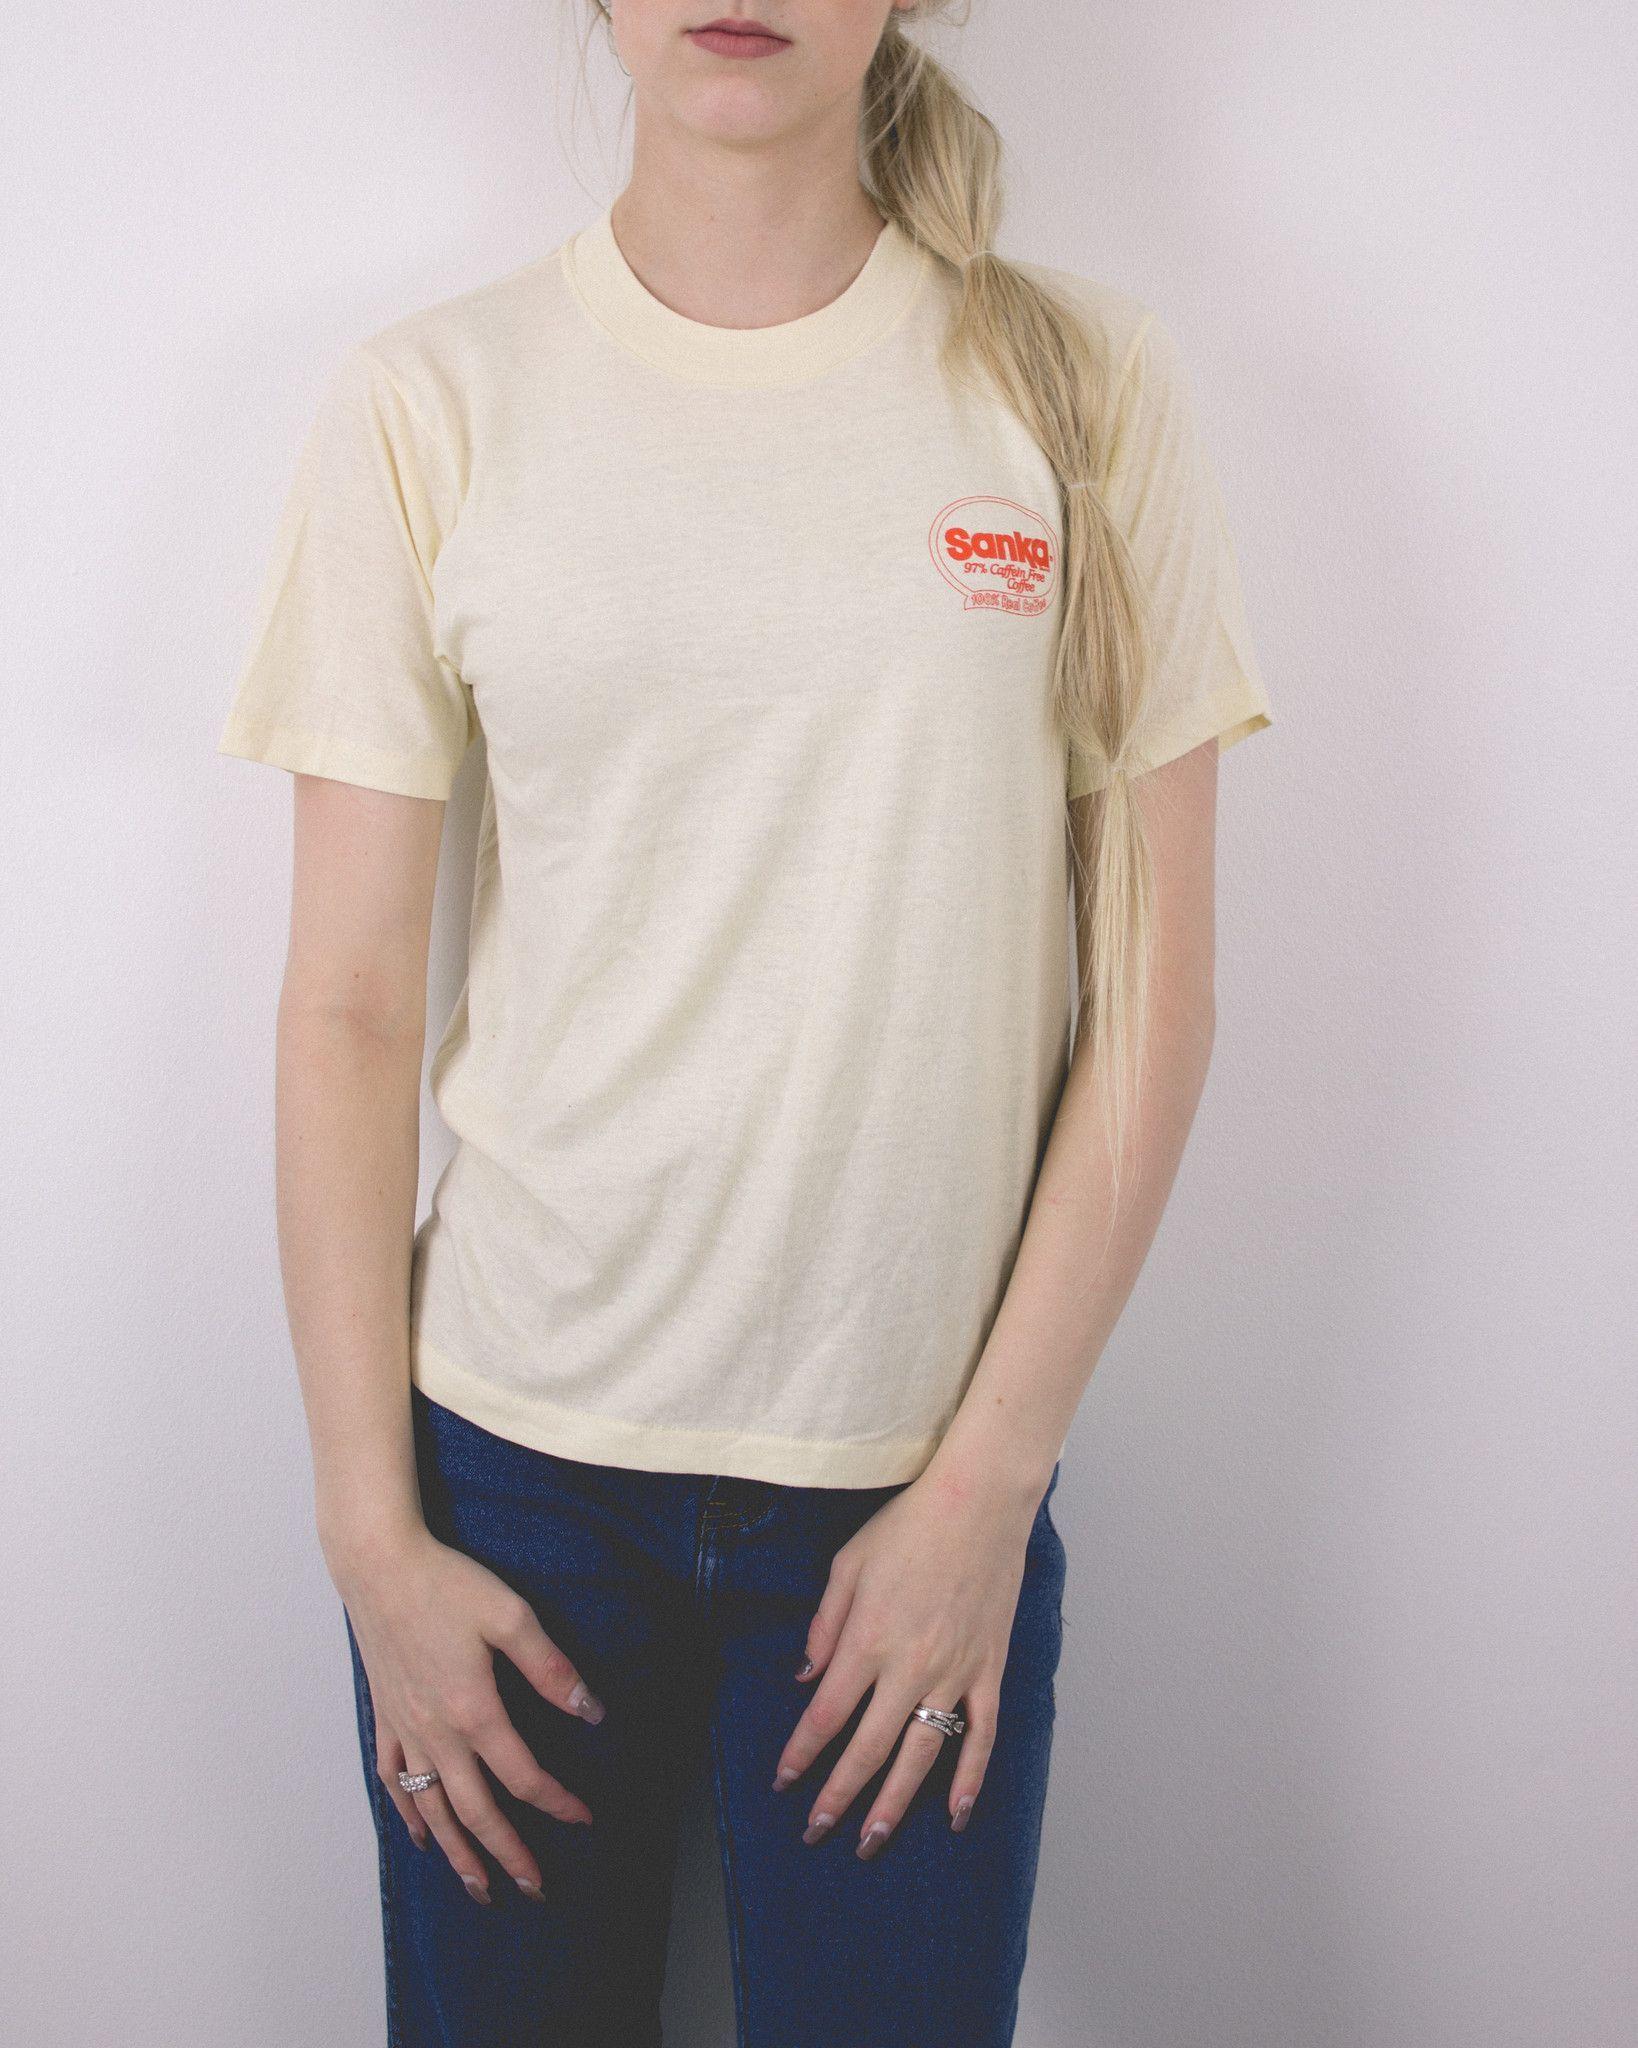 Vintage Sanka Coffee T Shirt